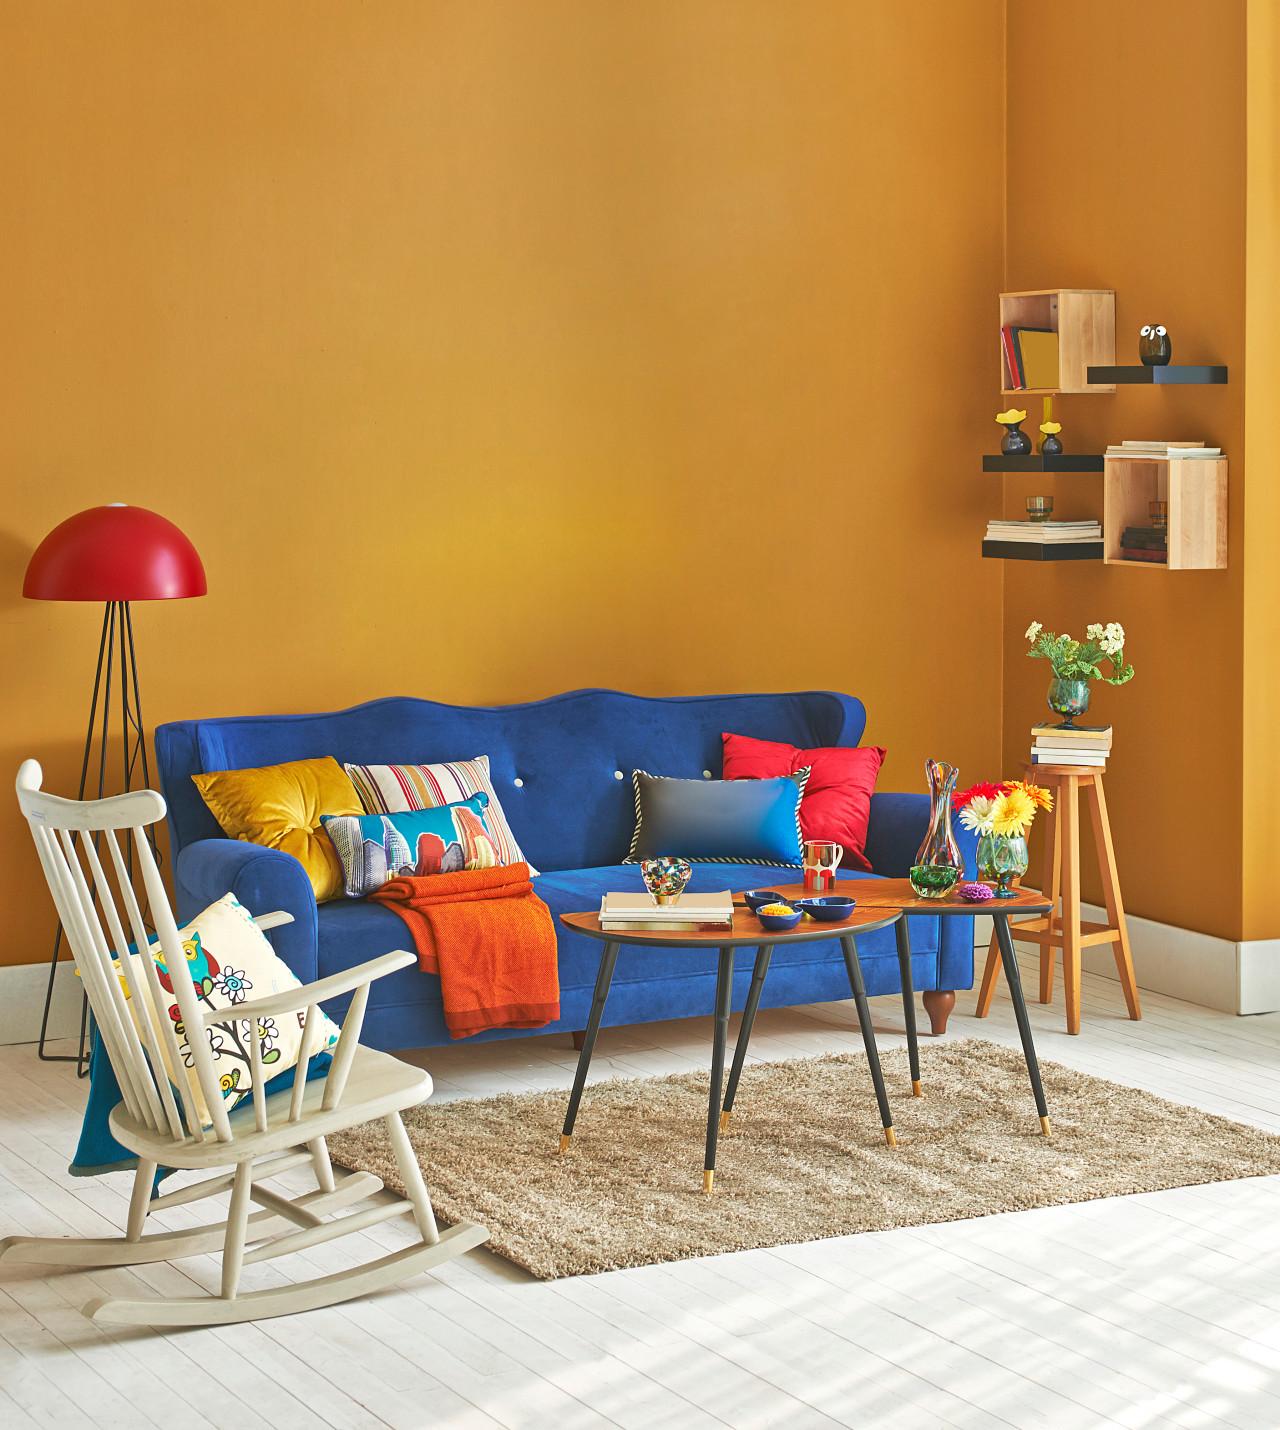 Postmodern design – vibrant and playful – seems